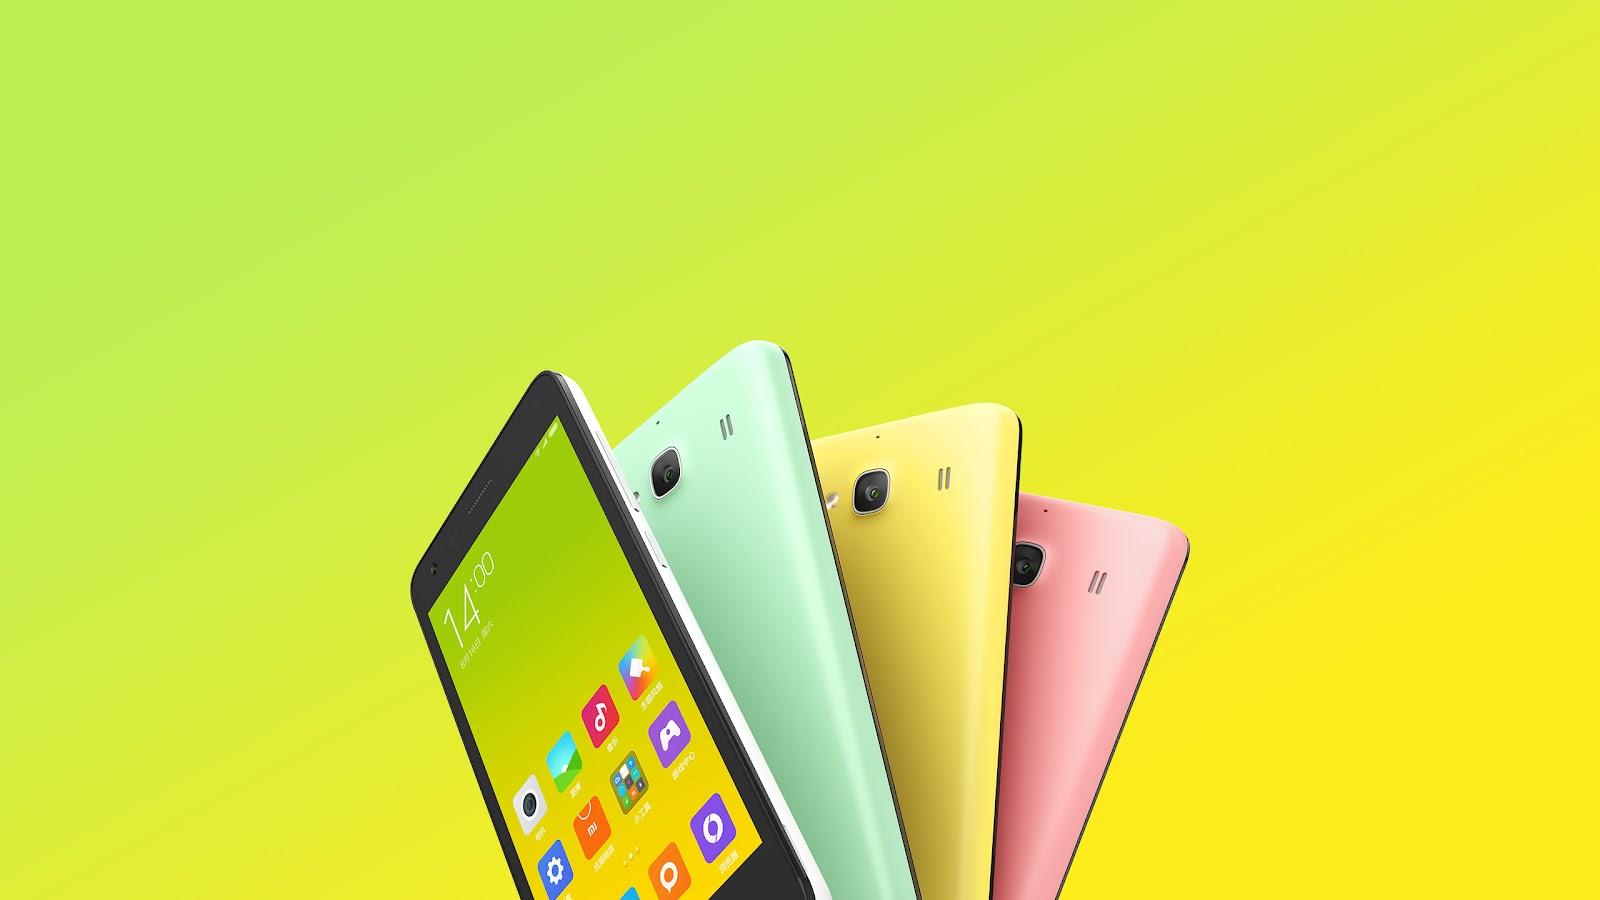 http://www.androidheadlines.com/wp-content/uploads/2015/01/Xiaomi-Redmi-2S_14.jpg